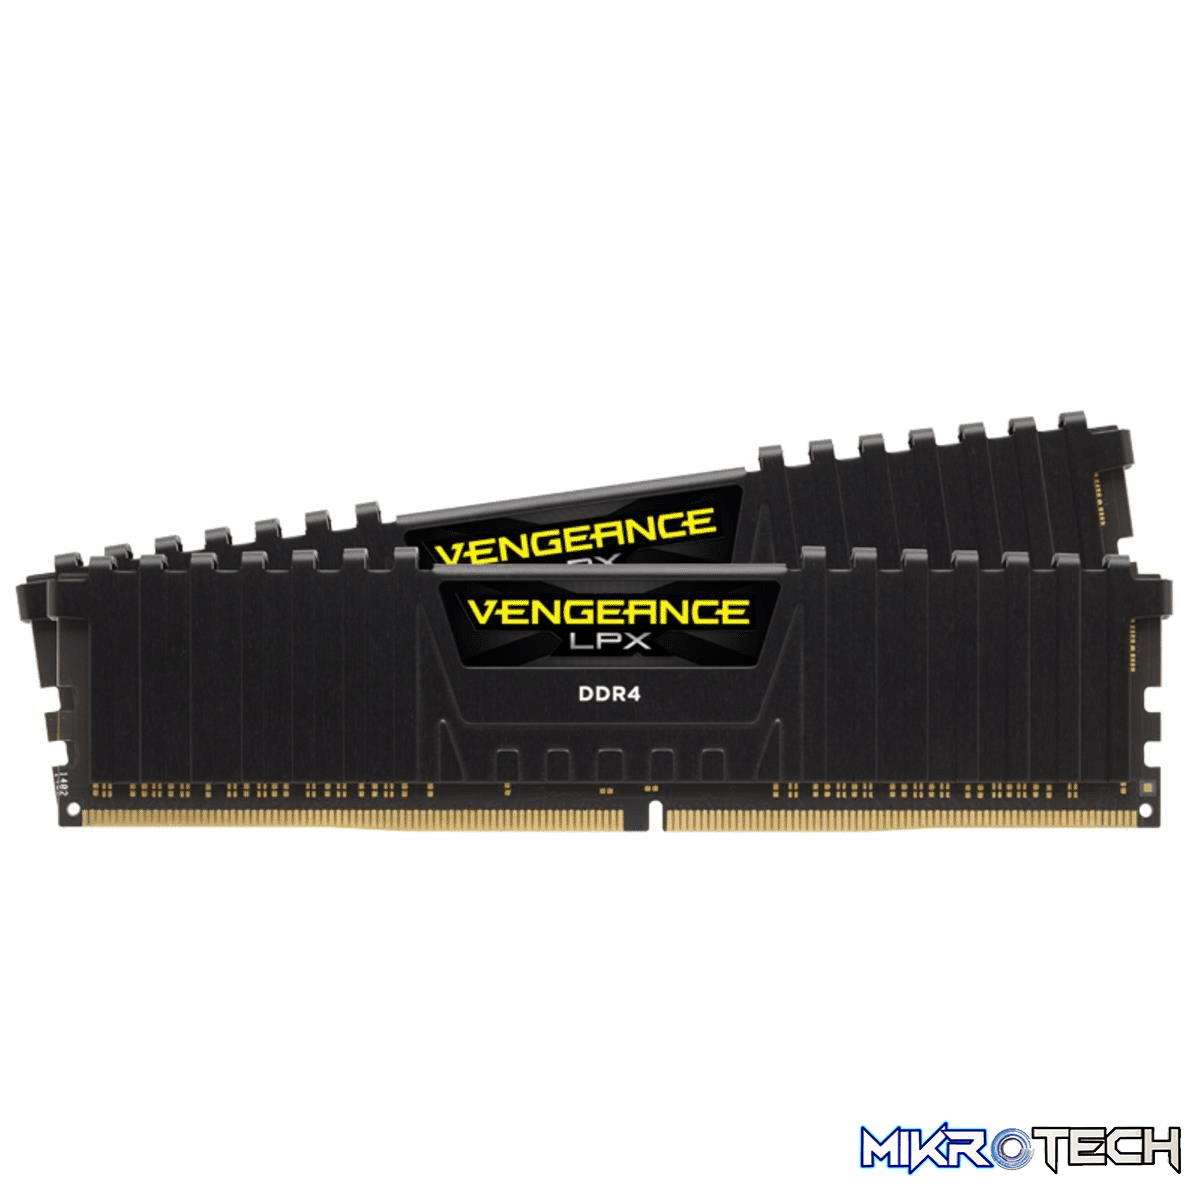 Corsair Vengeance LPX CMK16GX4M2D3000C16 Memory Module 16GB 2 x 8GB DDR4 3000MHz